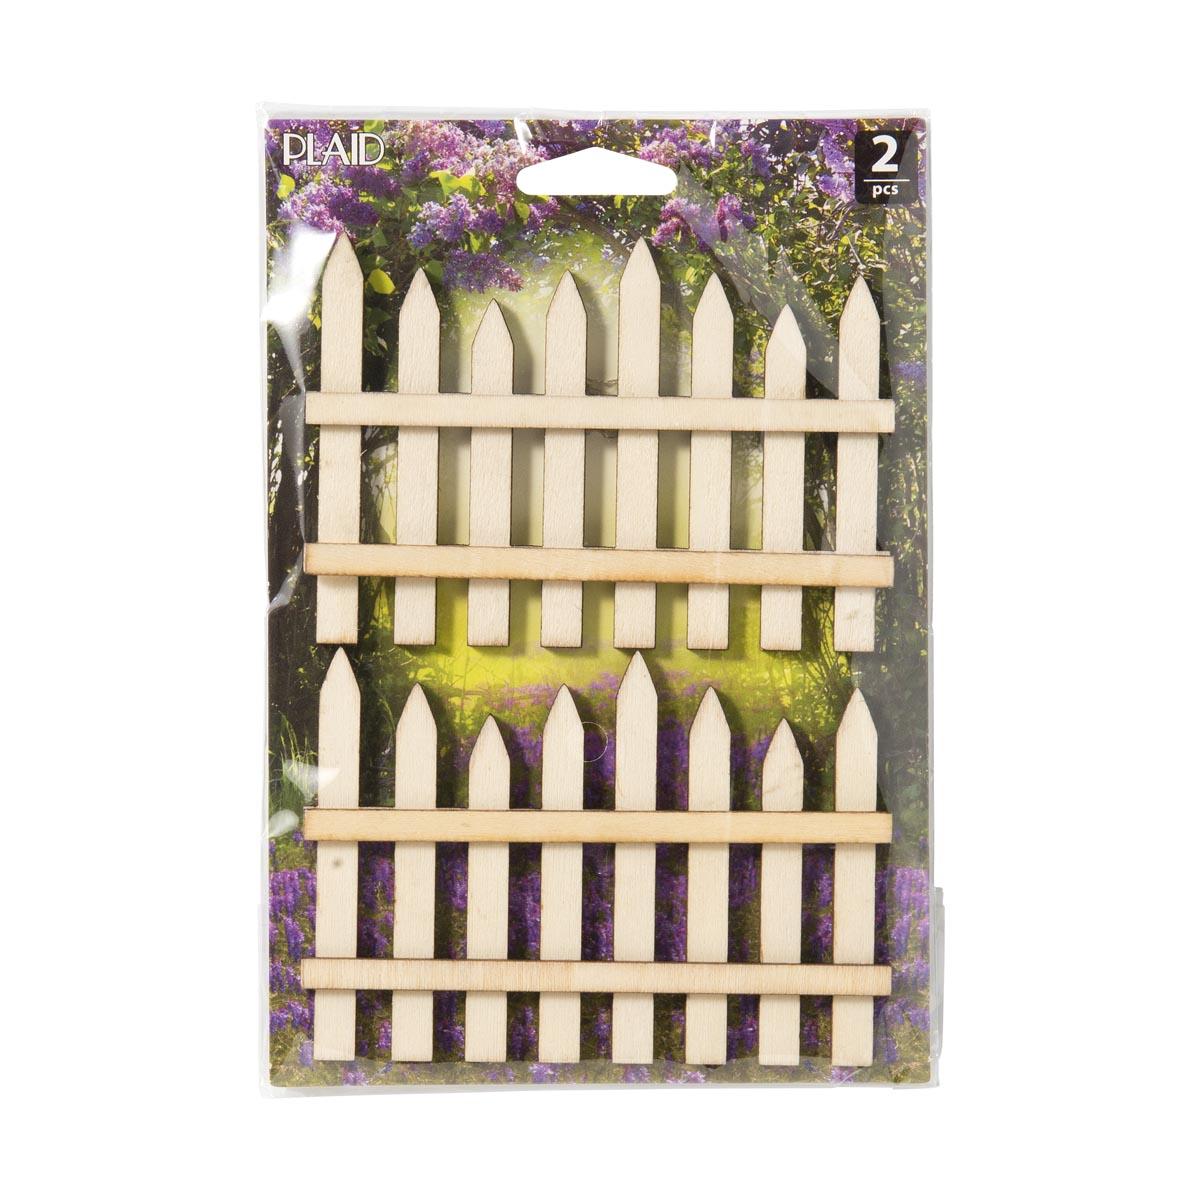 Plaid ® Wood Surfaces - Fairy Garden - Fence 2 pc.